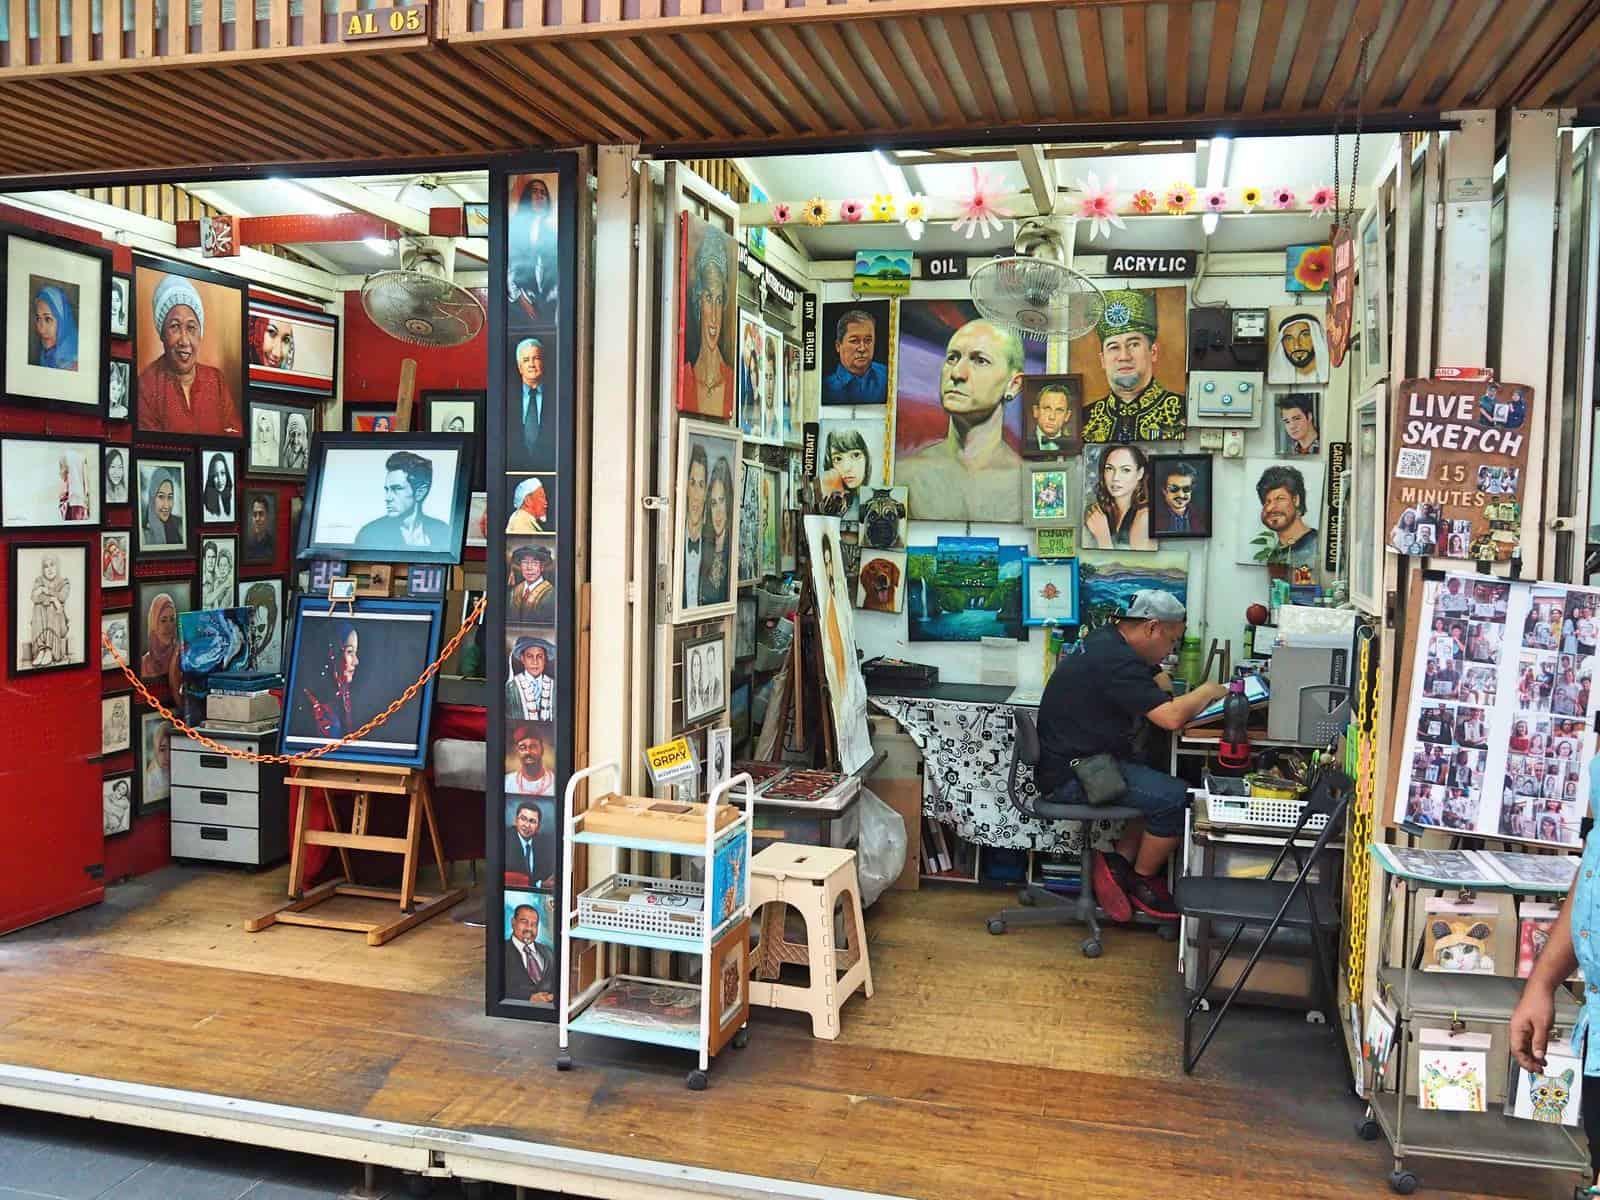 portrait-artists-Central-Market-Chinatown-Kuala-Lumpur-Malaysia ] Travel Mermaid